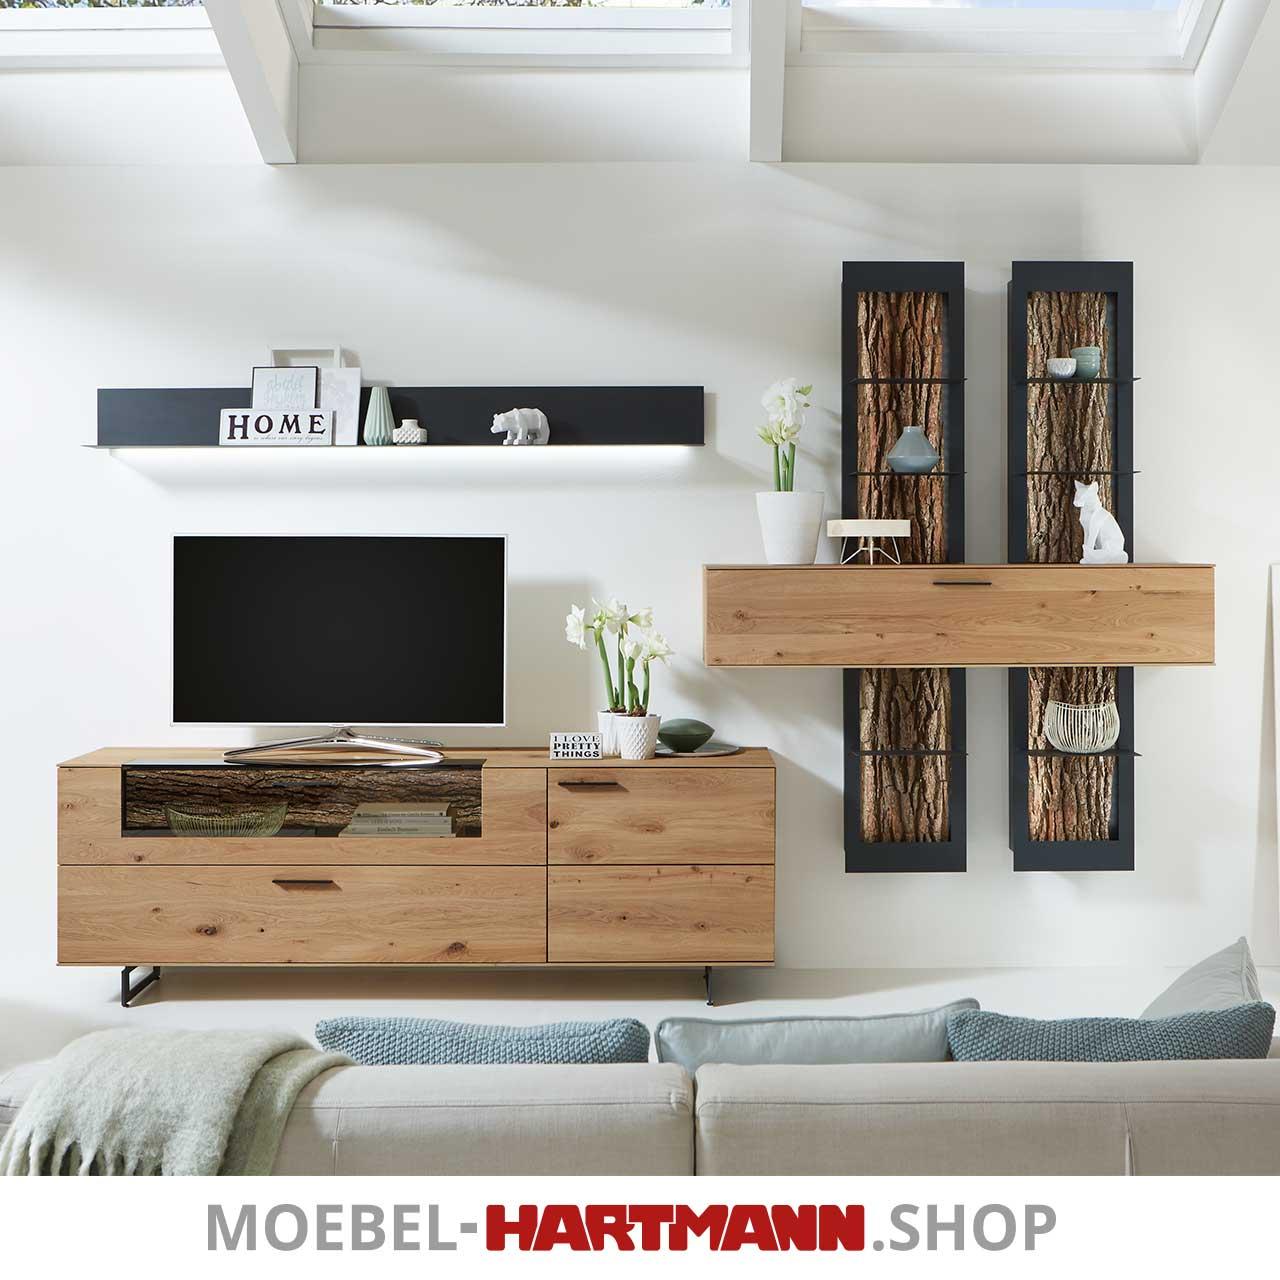 hartmann runa wohnwand 8410 nr 26 moebel. Black Bedroom Furniture Sets. Home Design Ideas